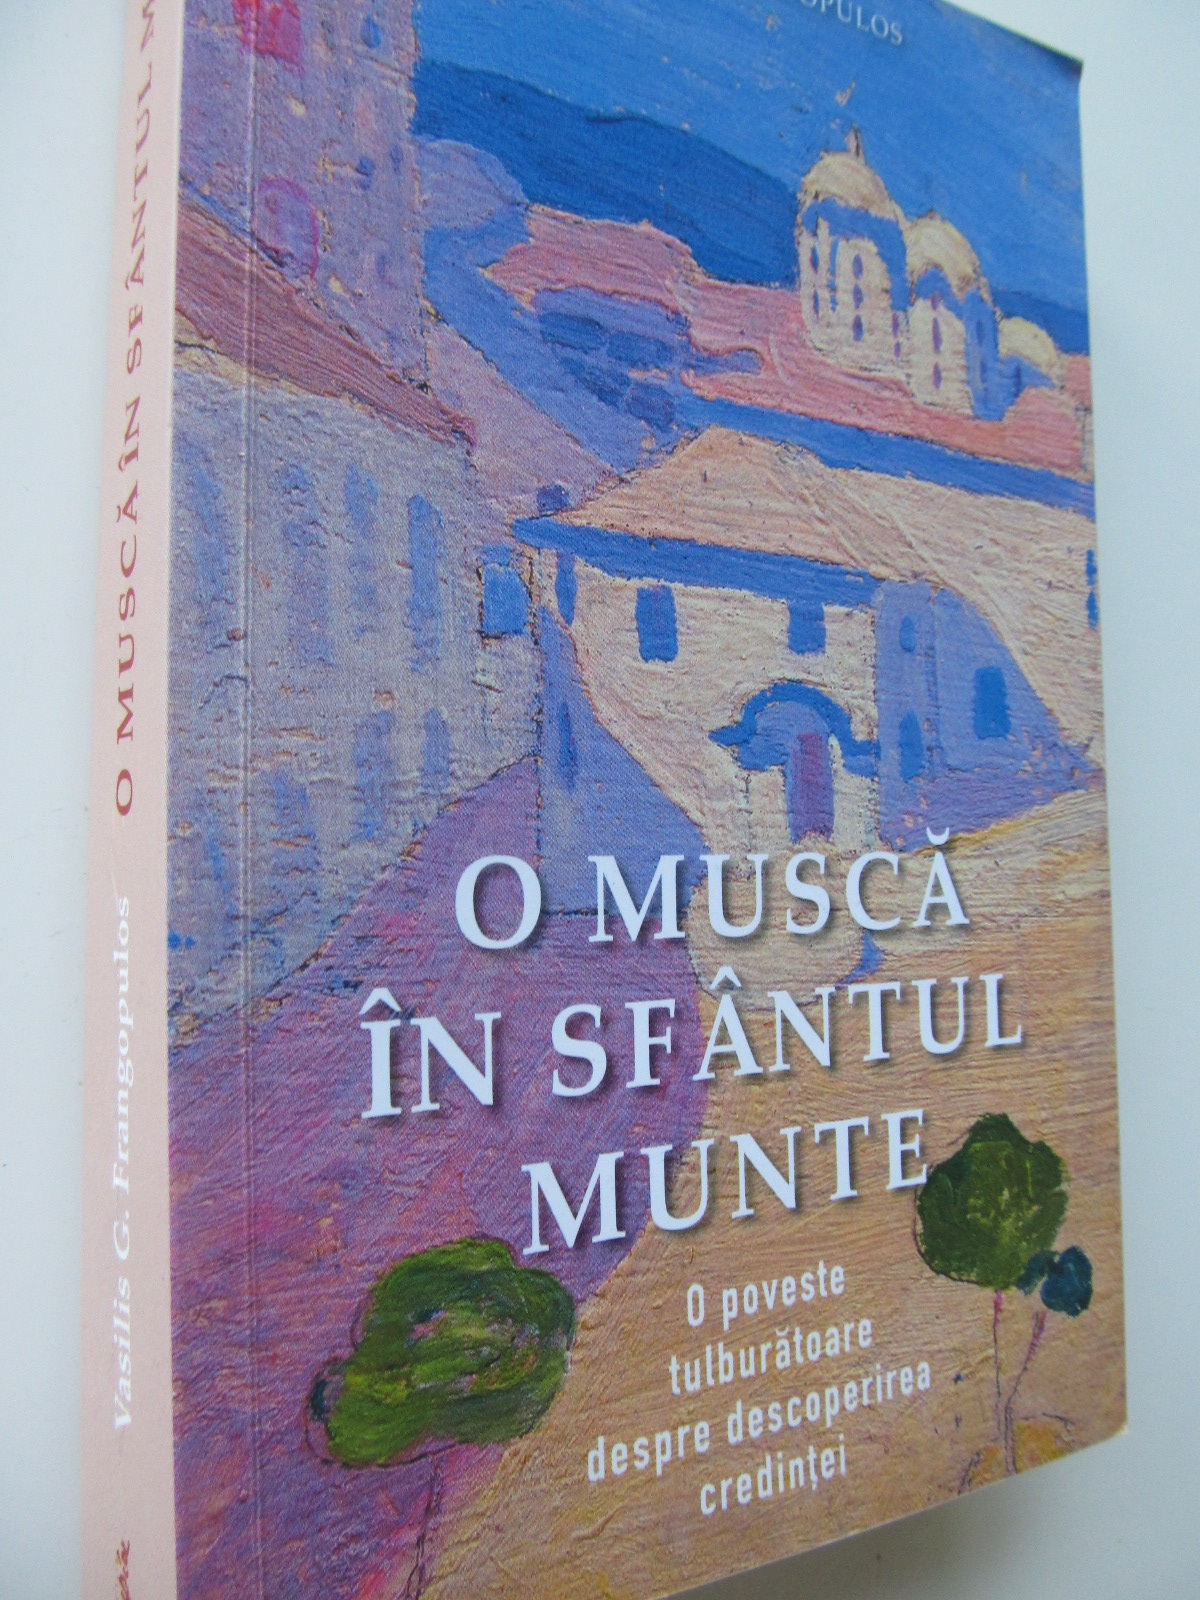 O musca in sfantul munte - Vasilis Frangopulos | Detalii carte